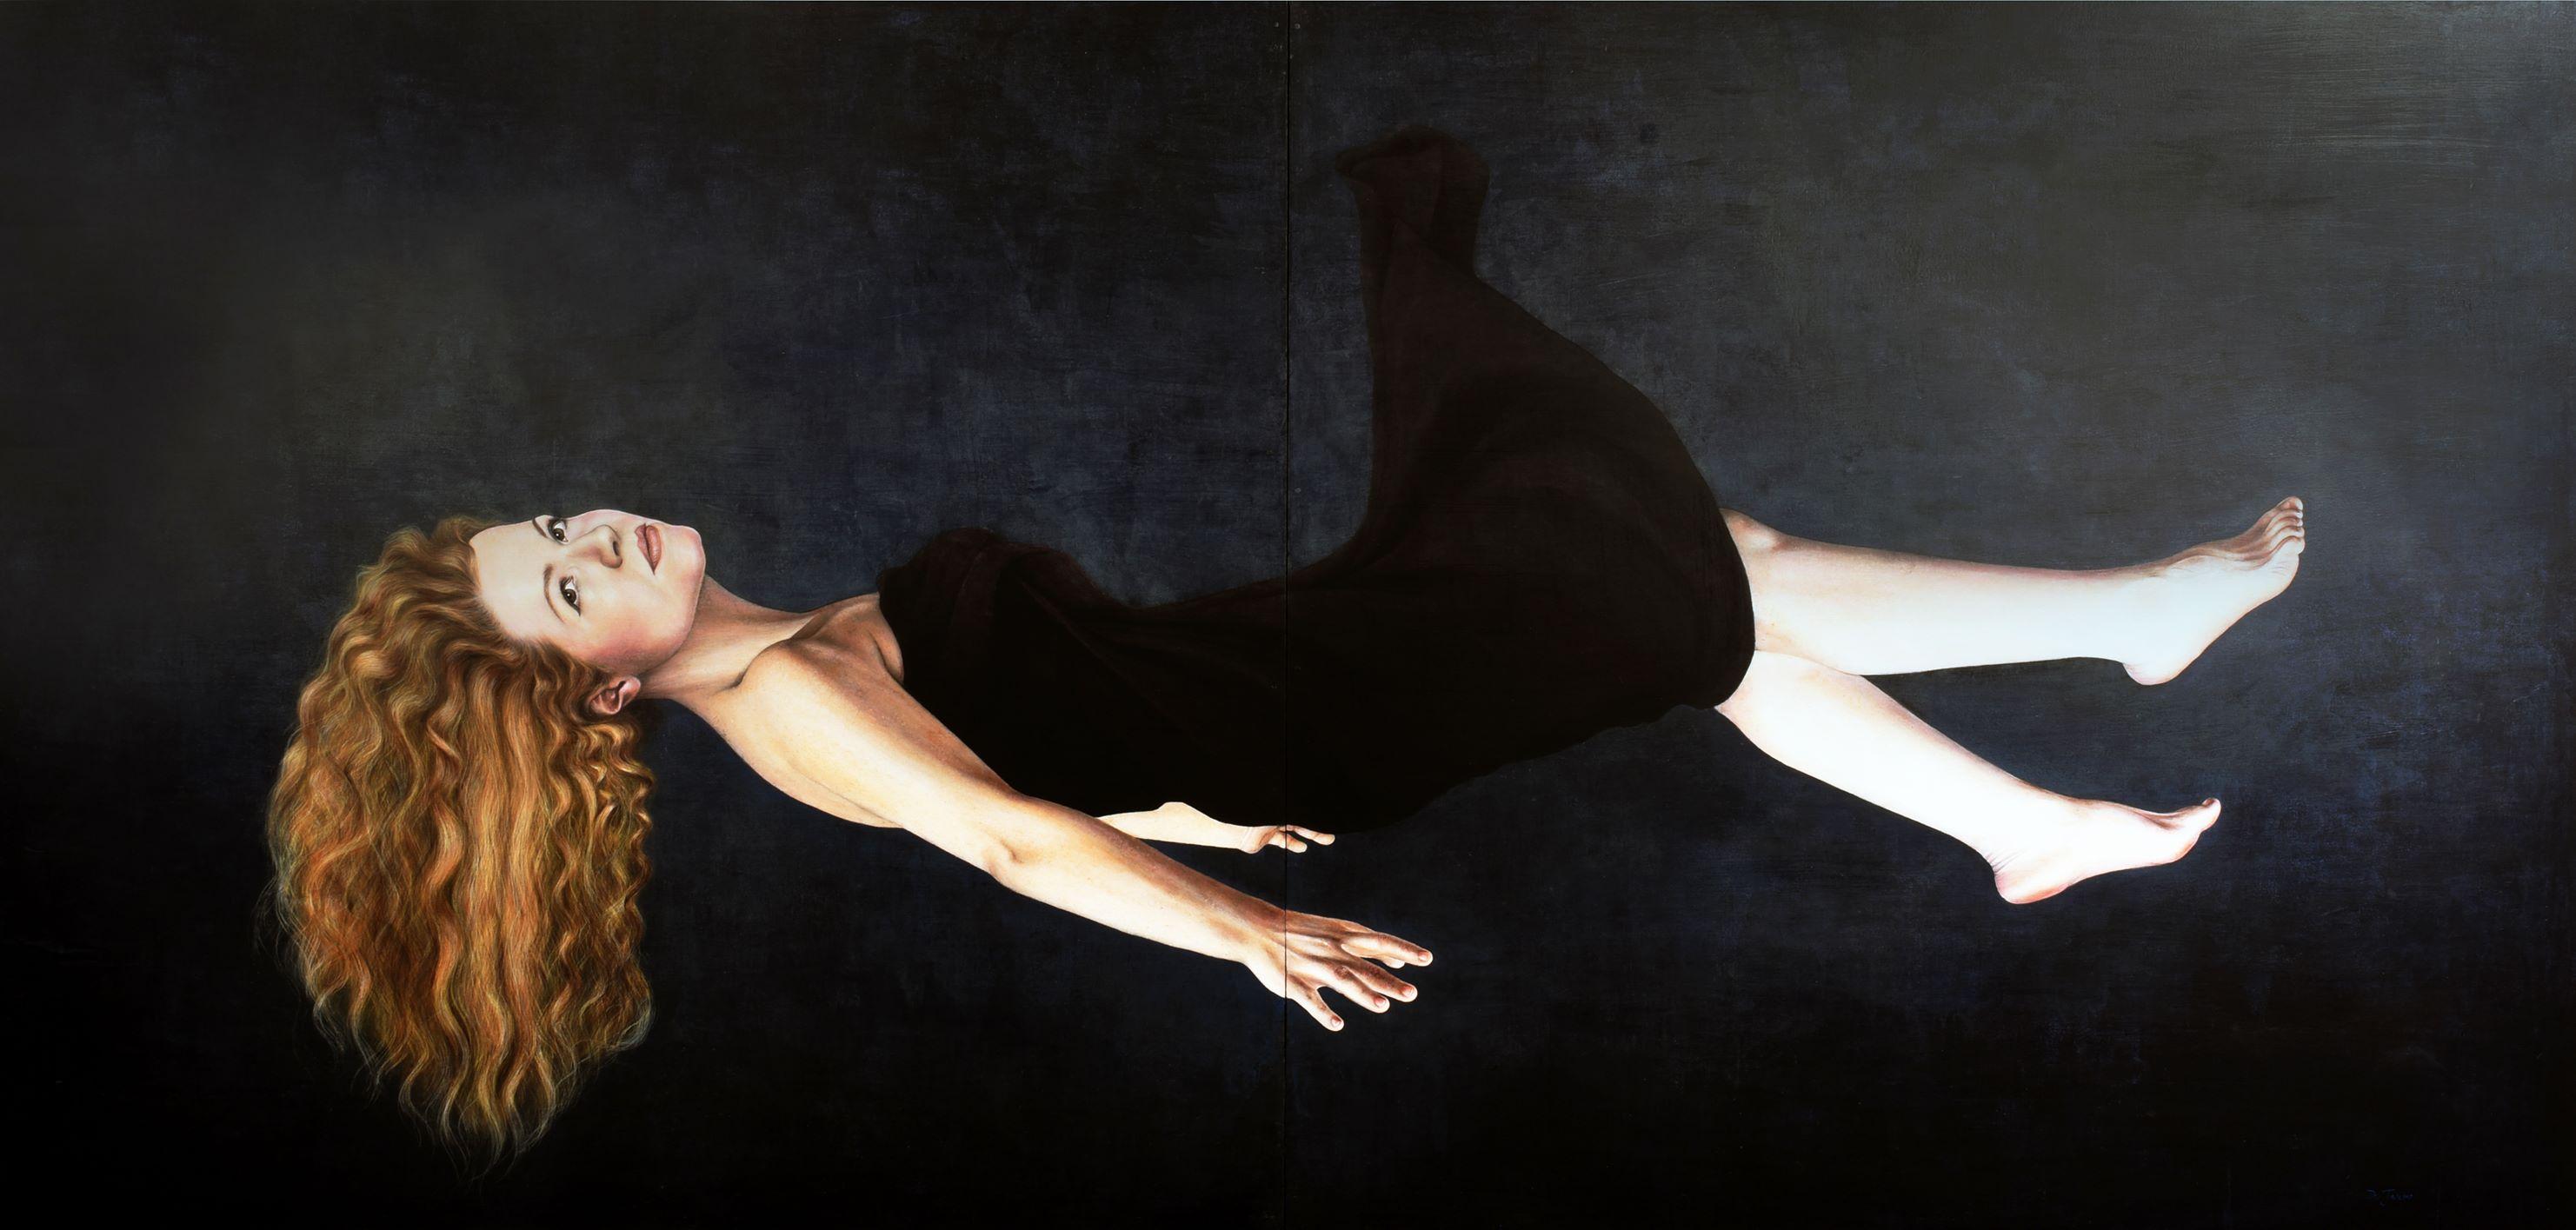 "Sandra De Jaume, ""Levitació"", 2016 www.sandradejaume.com"